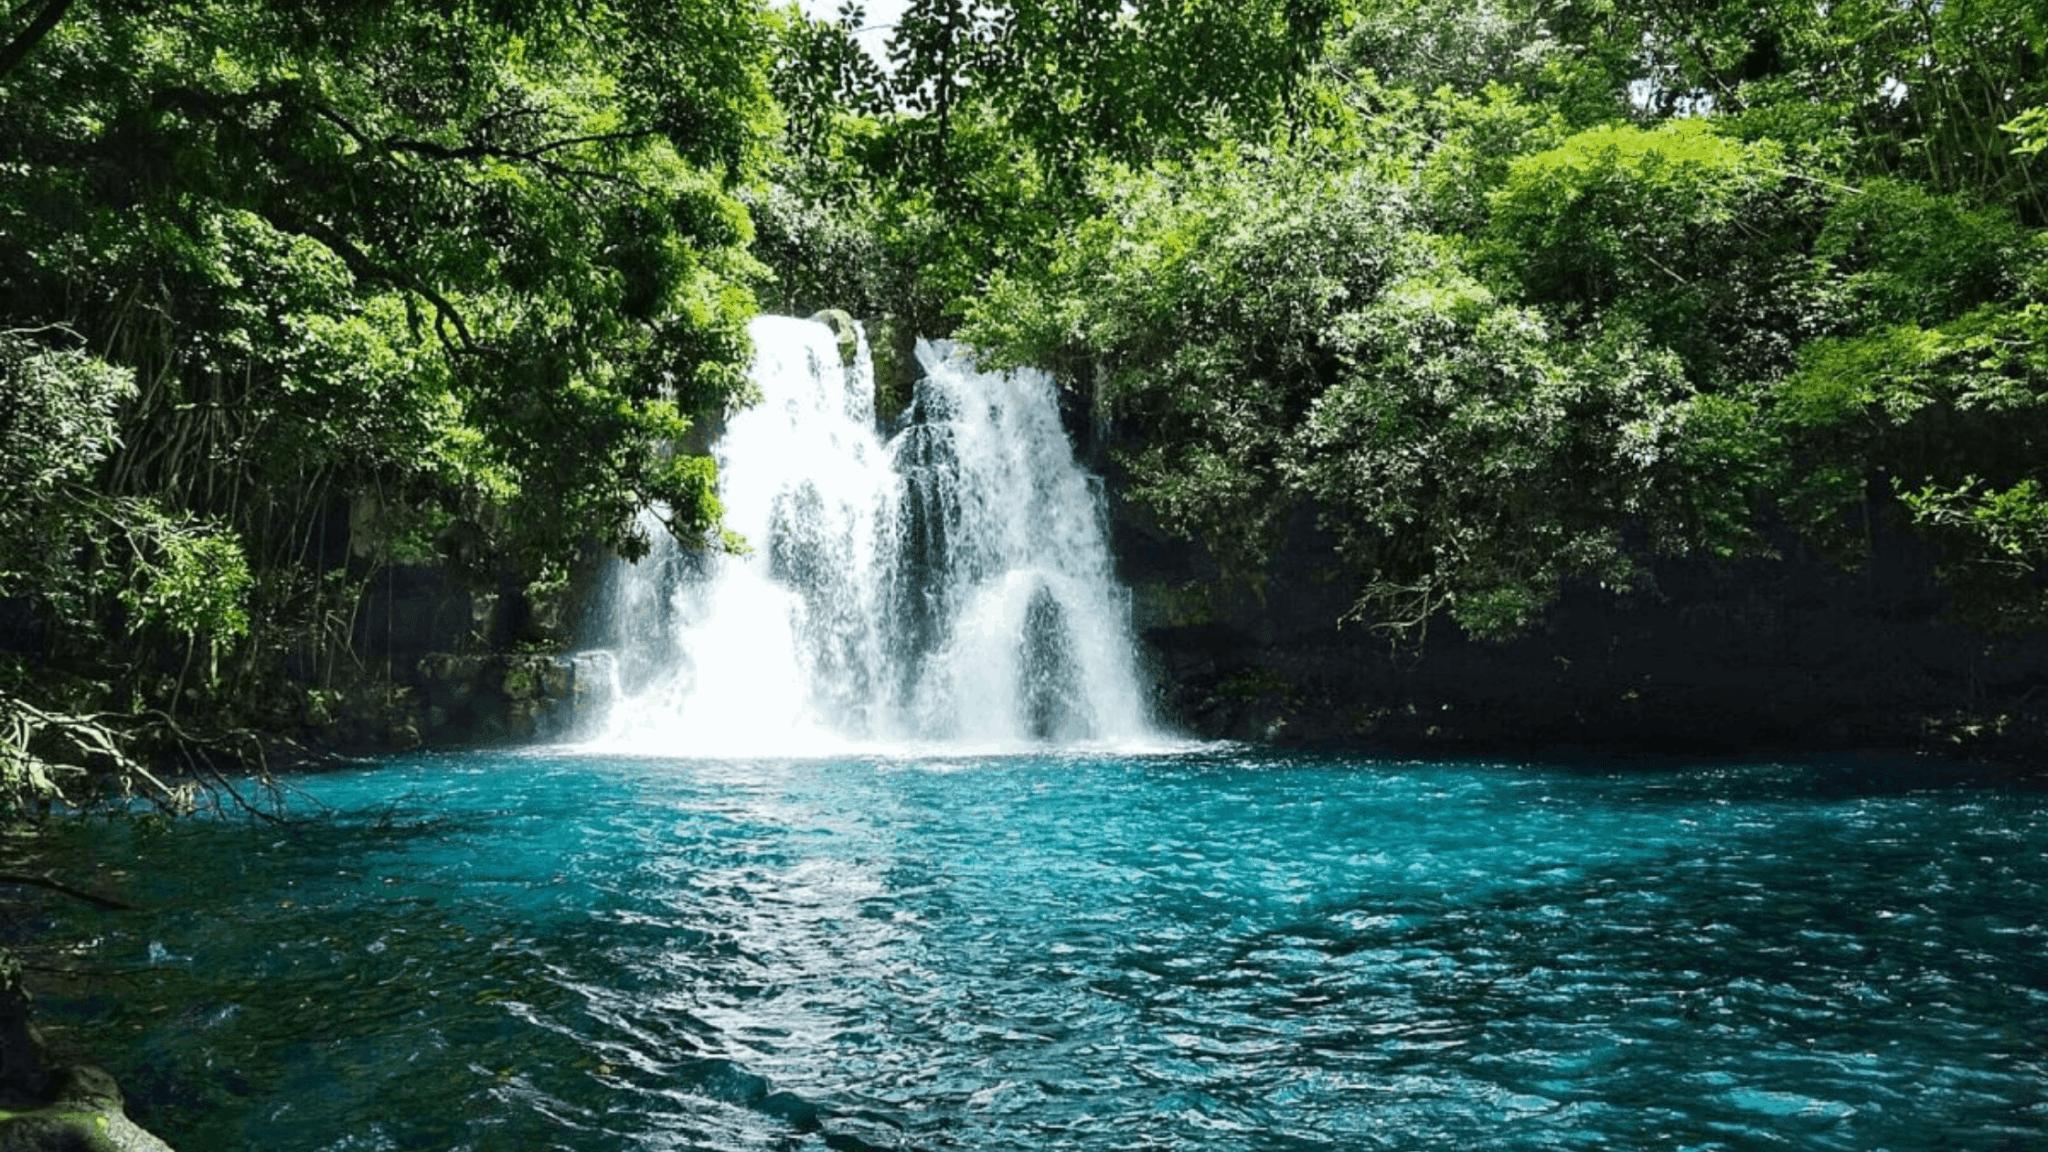 Cascade d'eau bleue